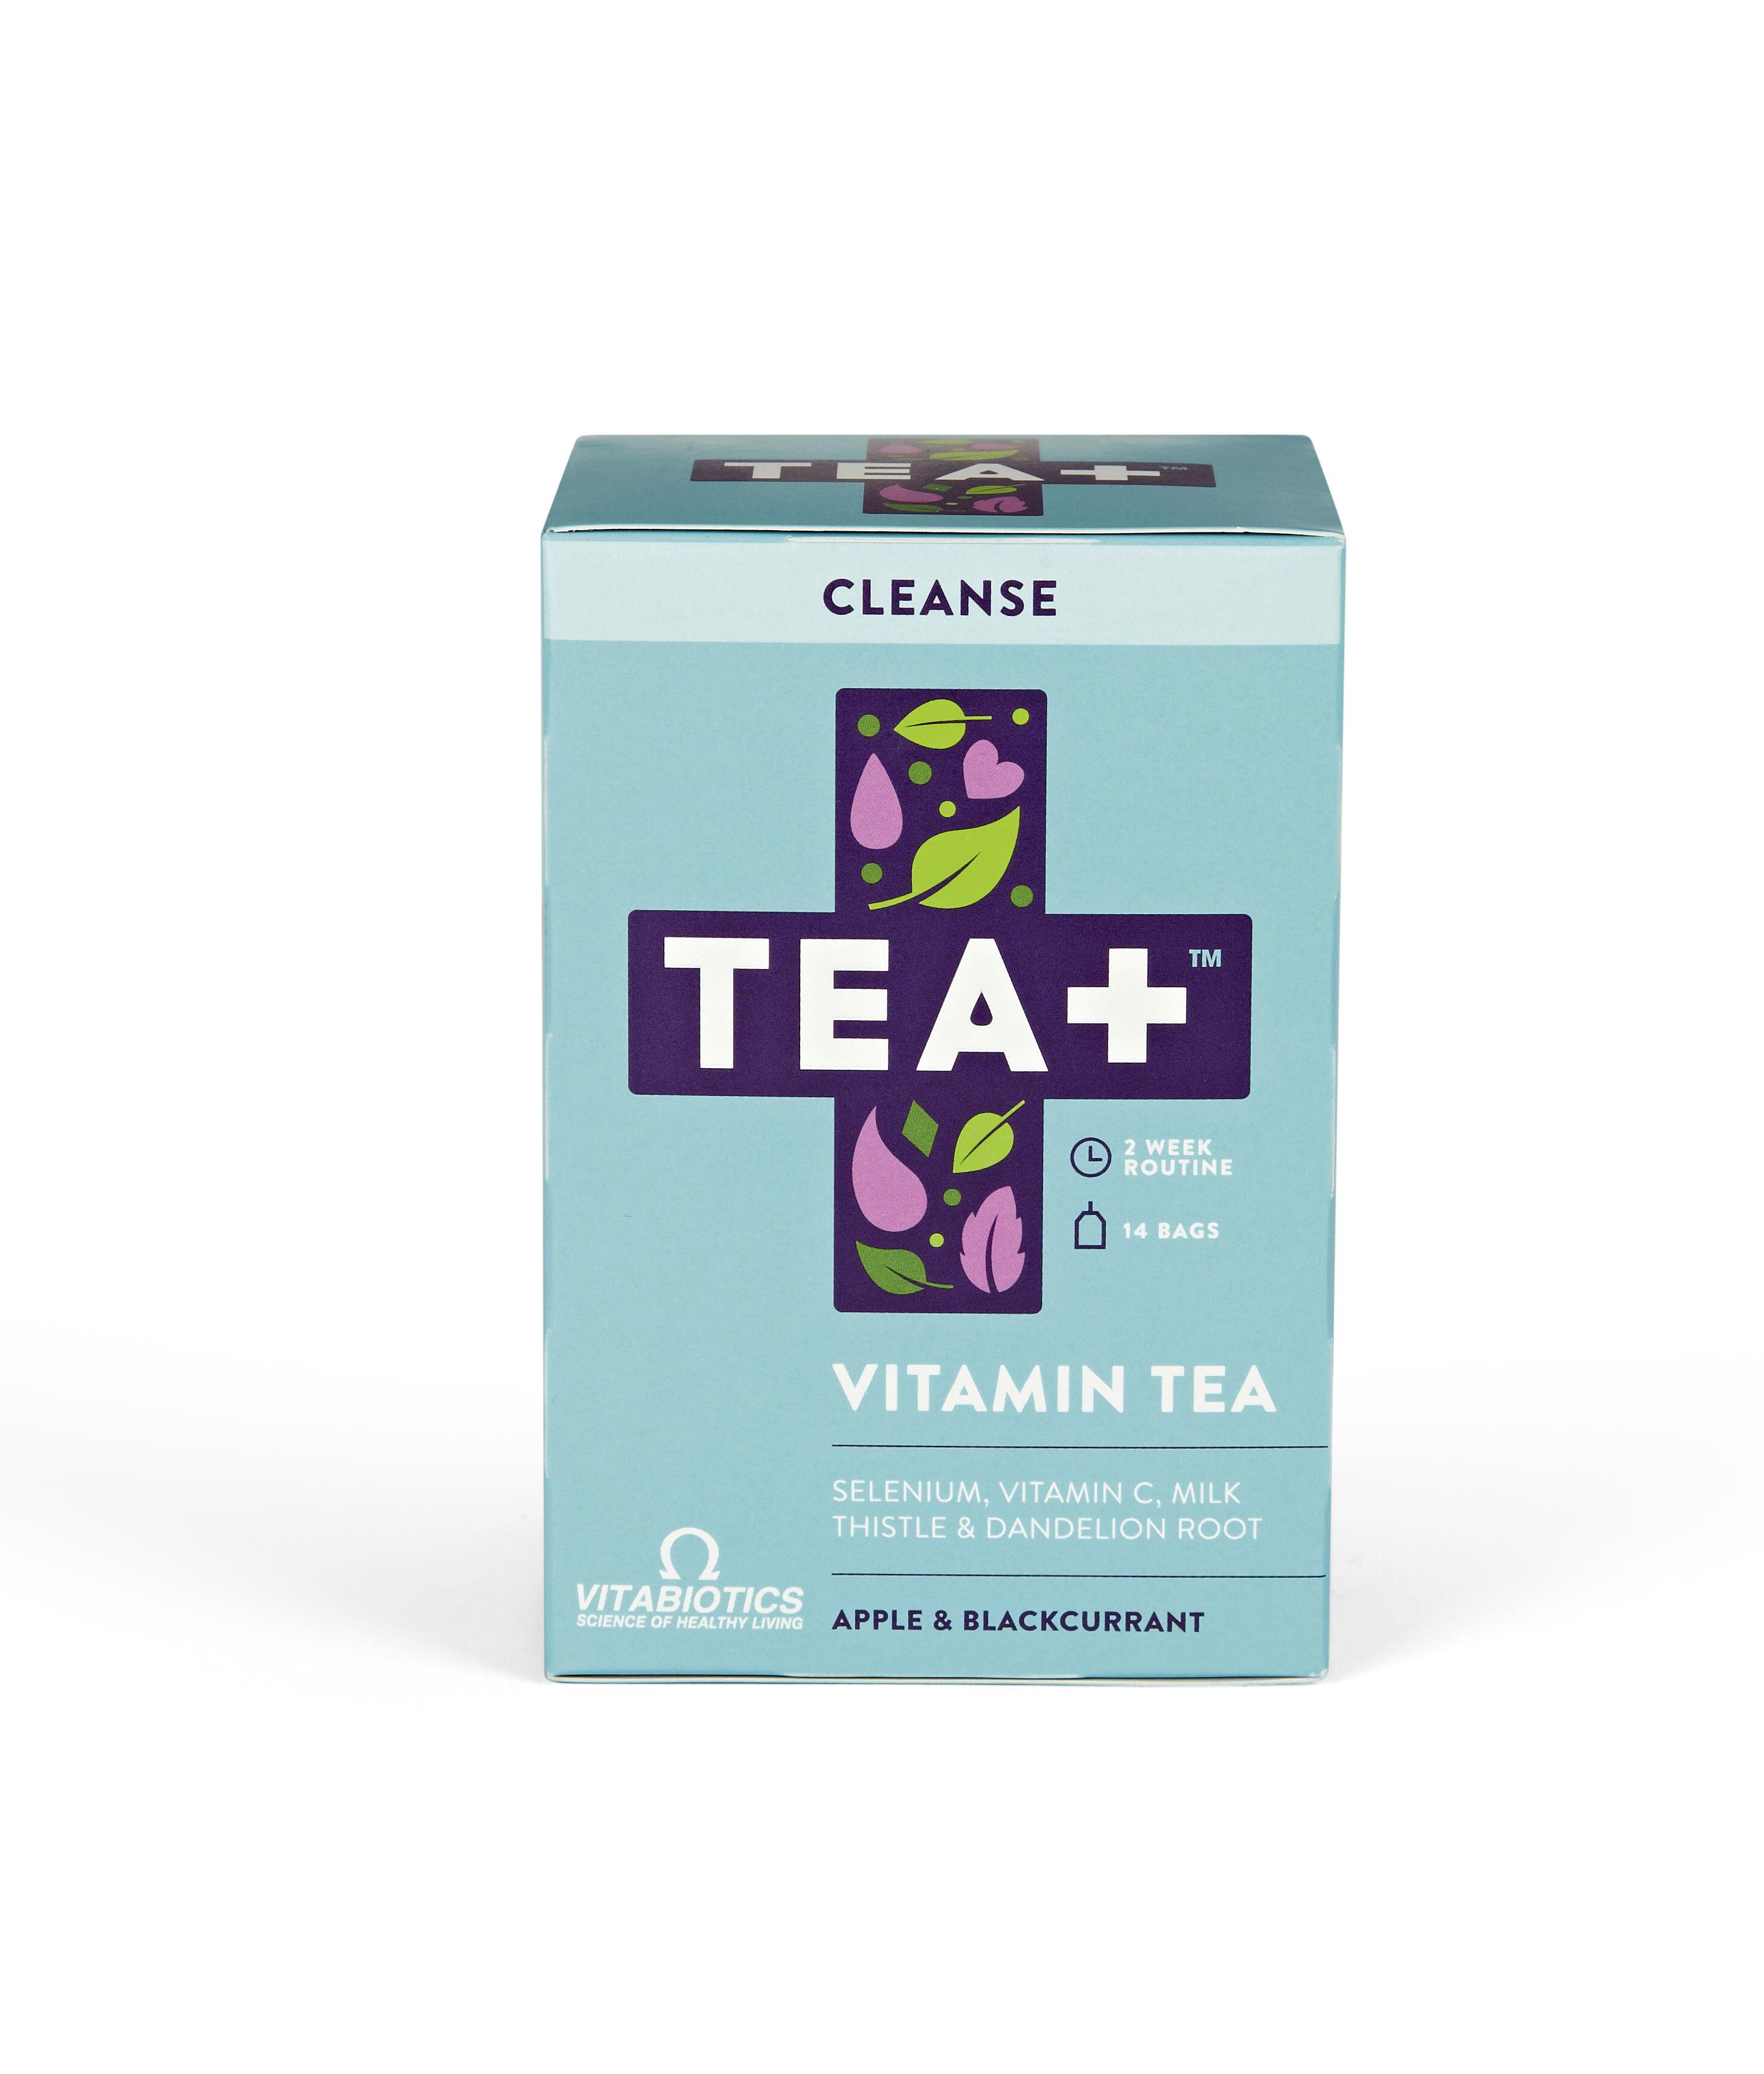 tea_cleanse_3d